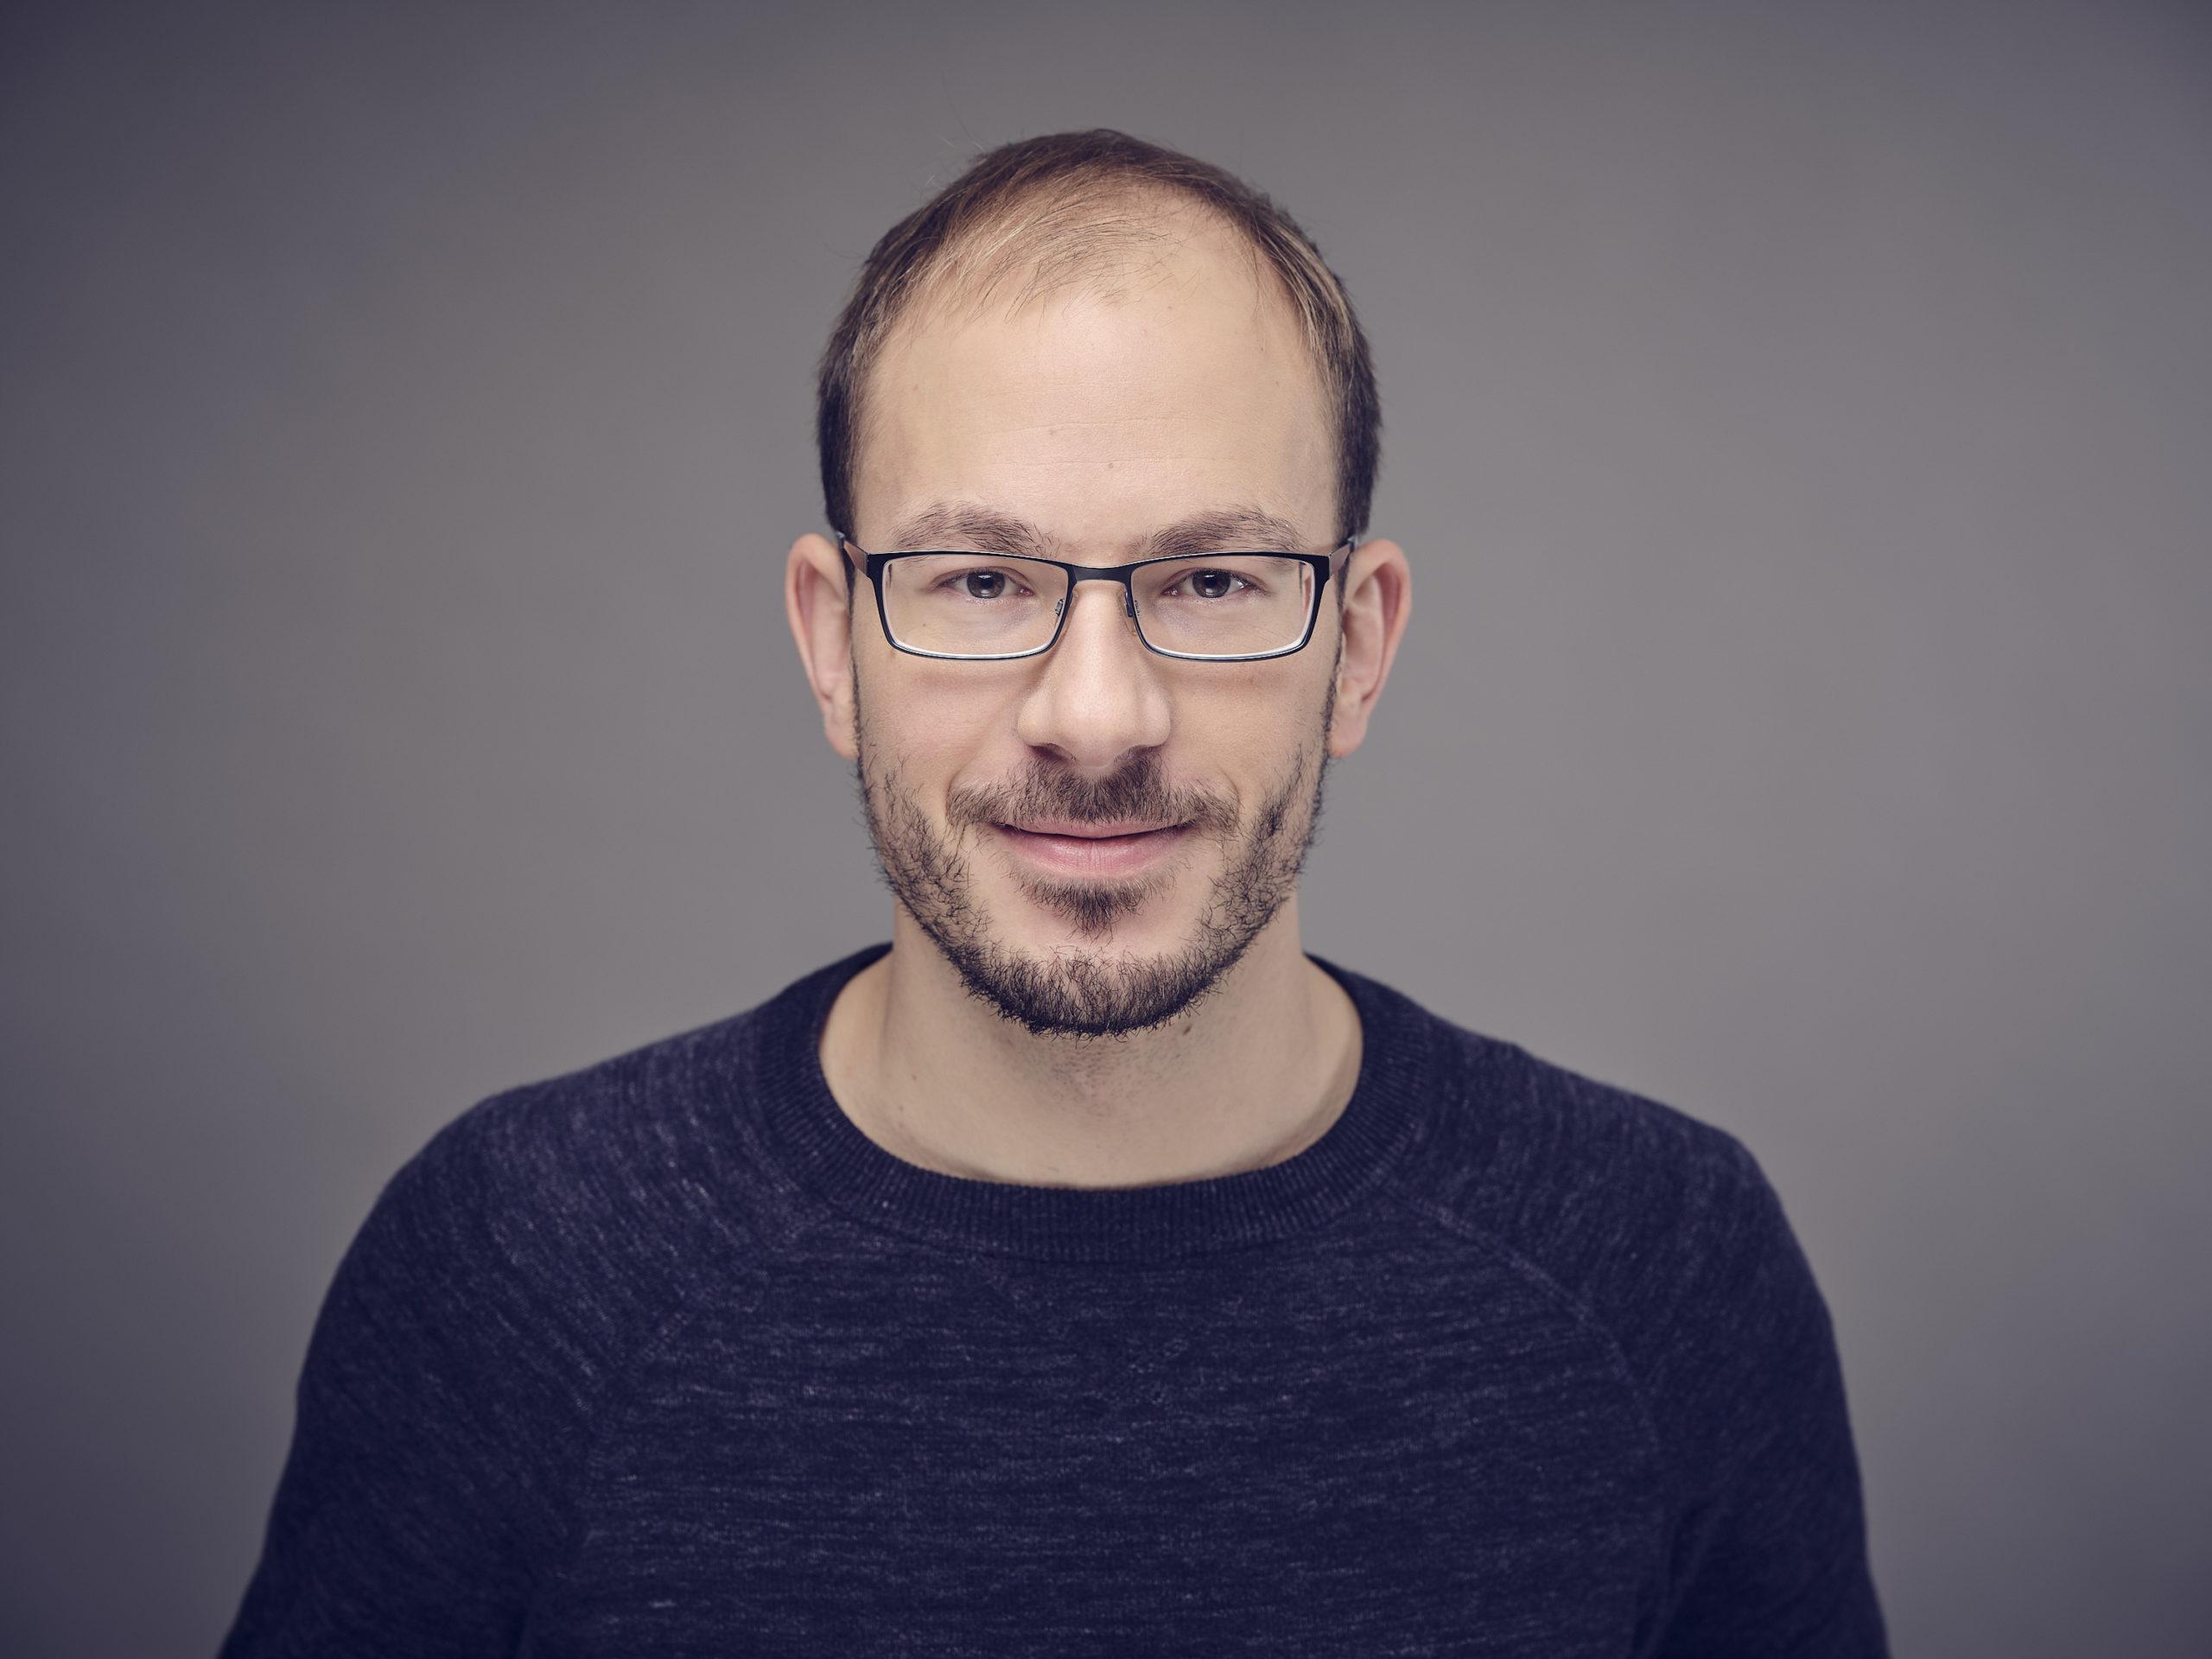 Portrait of Matthias Jobst